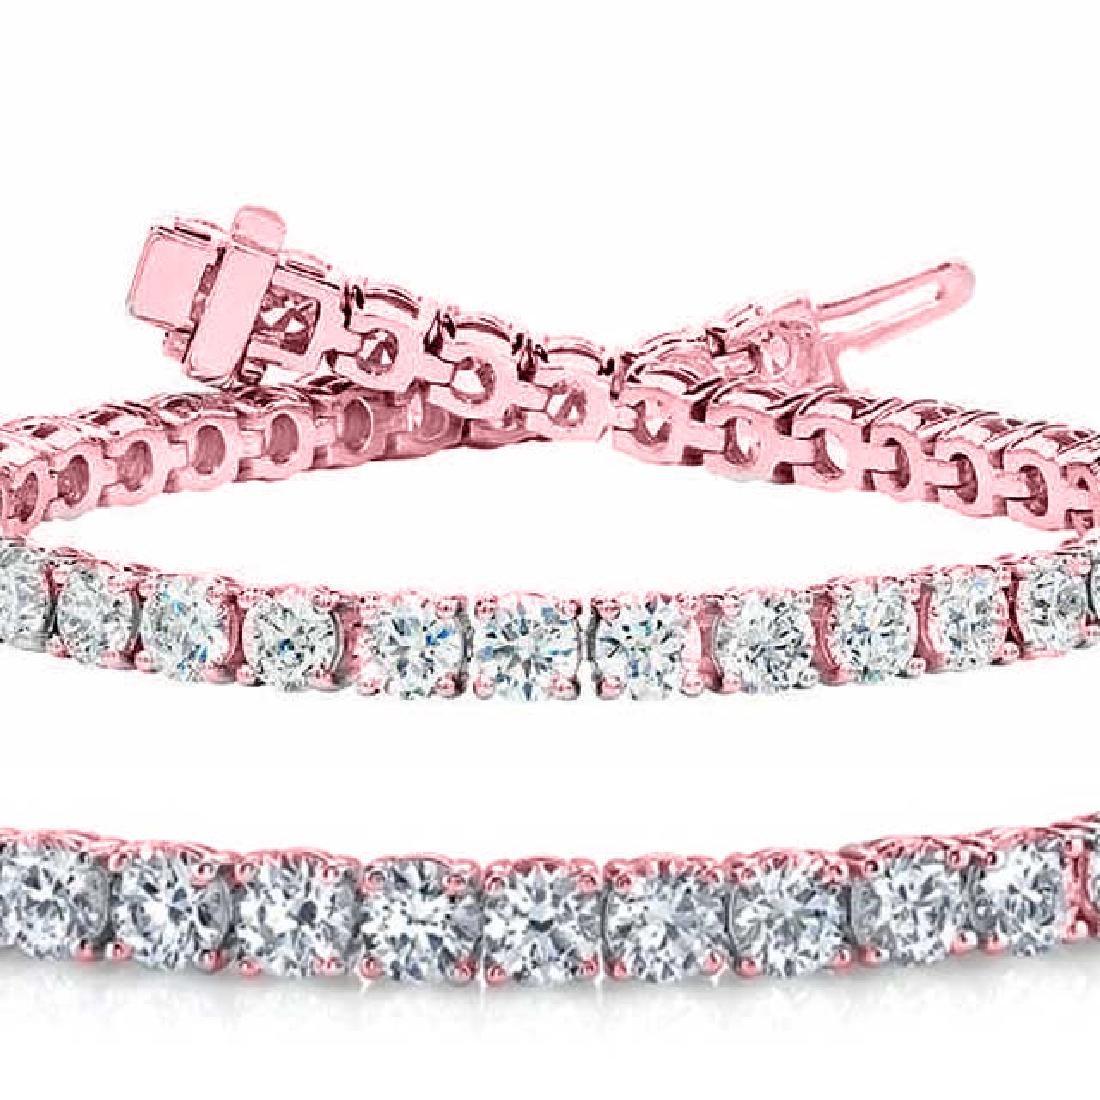 Natural 6ct VS-SI Diamond Tennis Bracelet 14K Rose Gold